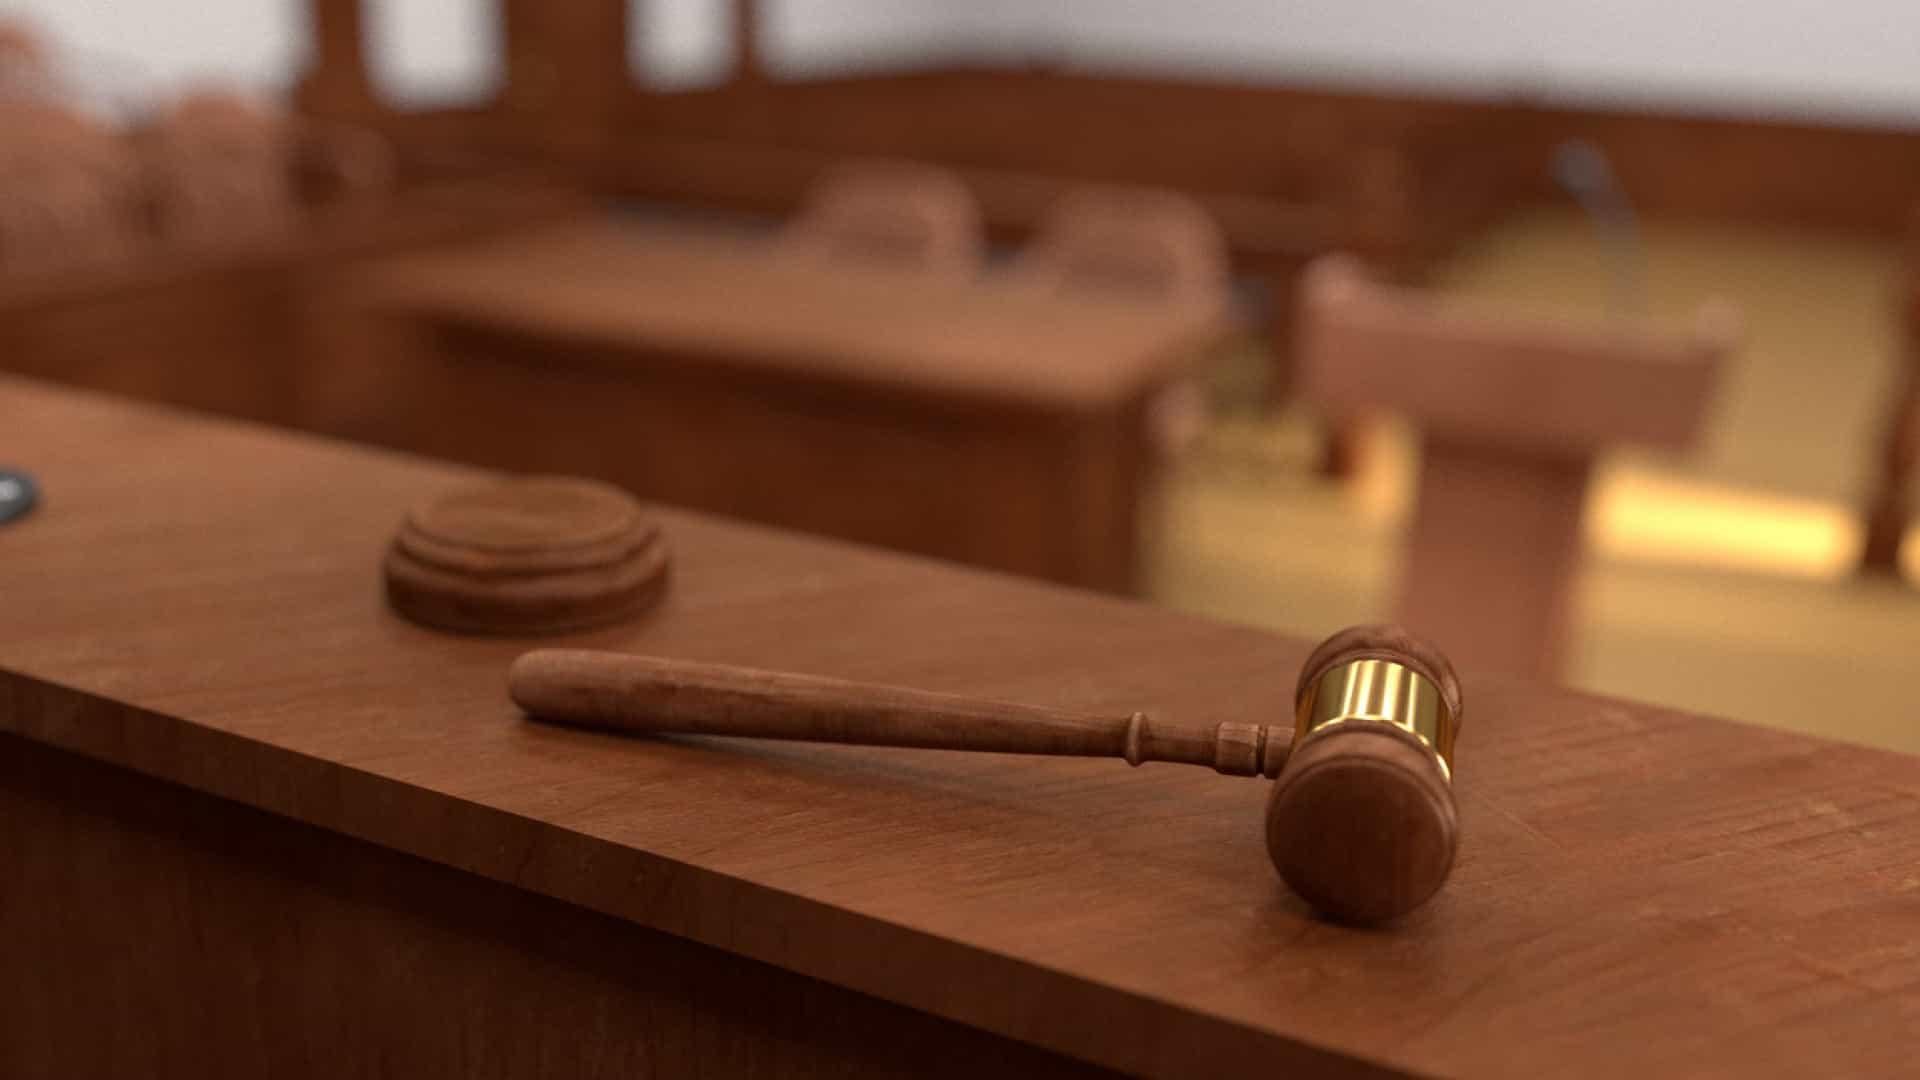 Casal de Fafe acusado de burlar familiar idosa em 280 mil euros